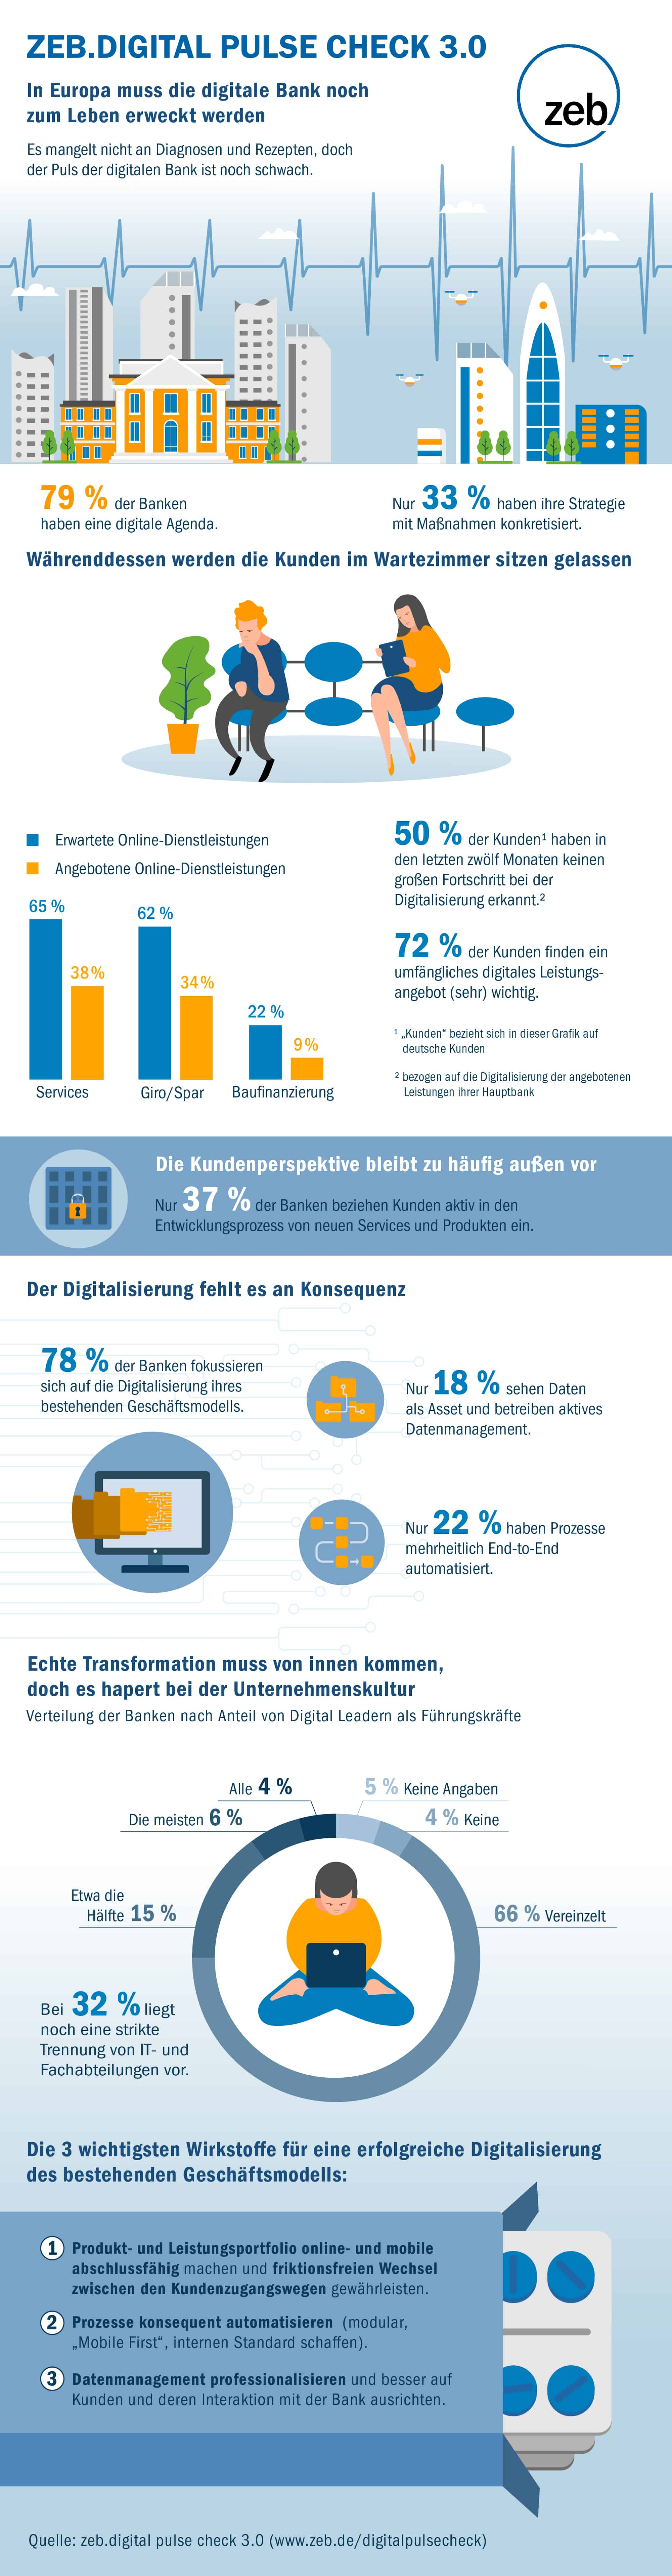 Digitalisierung Banken